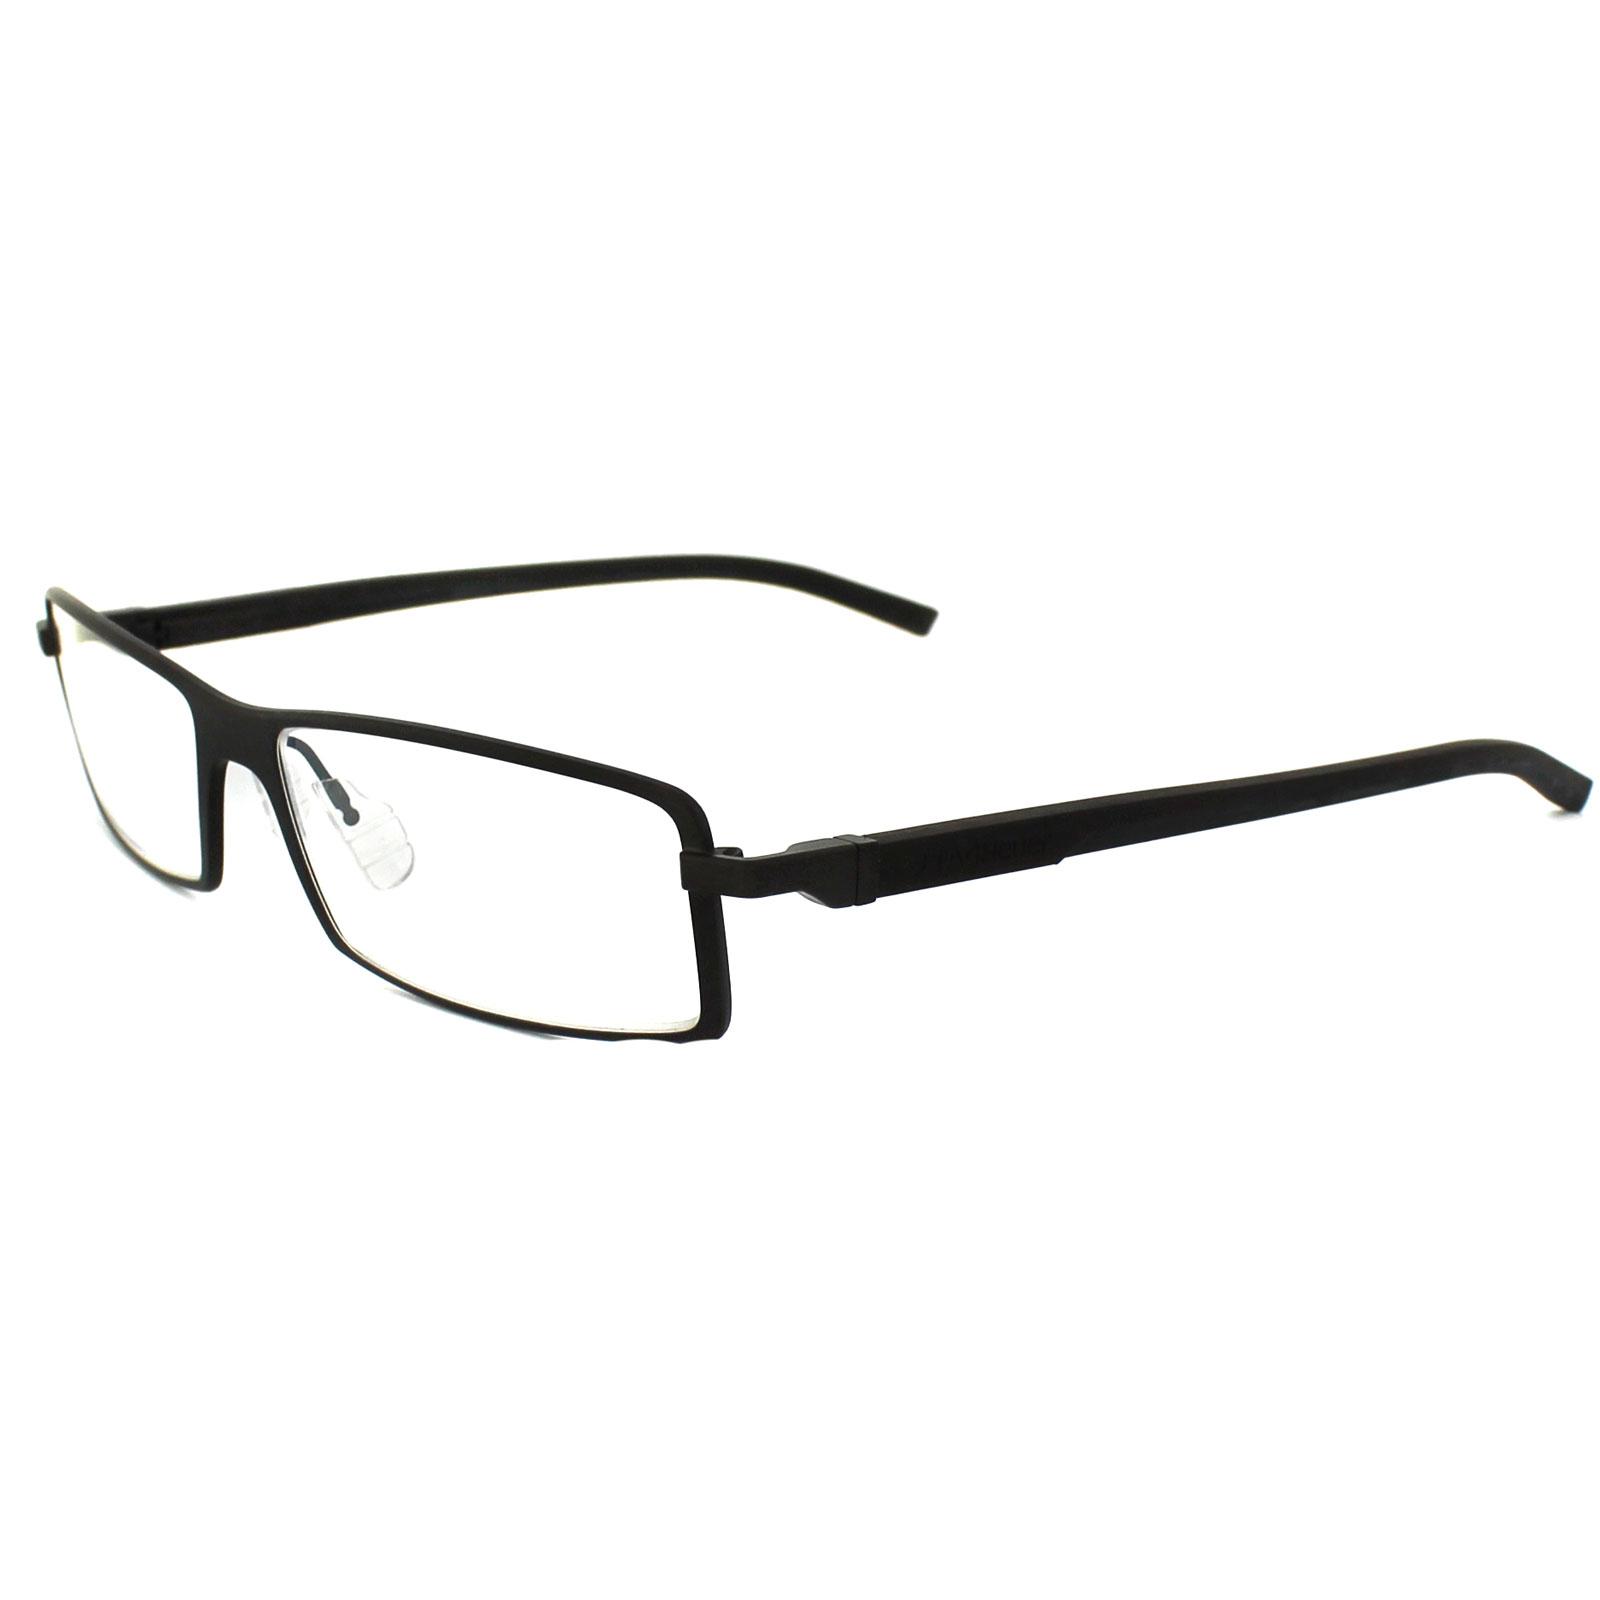 Tag Heuer Glasses Frames Automatic 003 Matt Chocolate